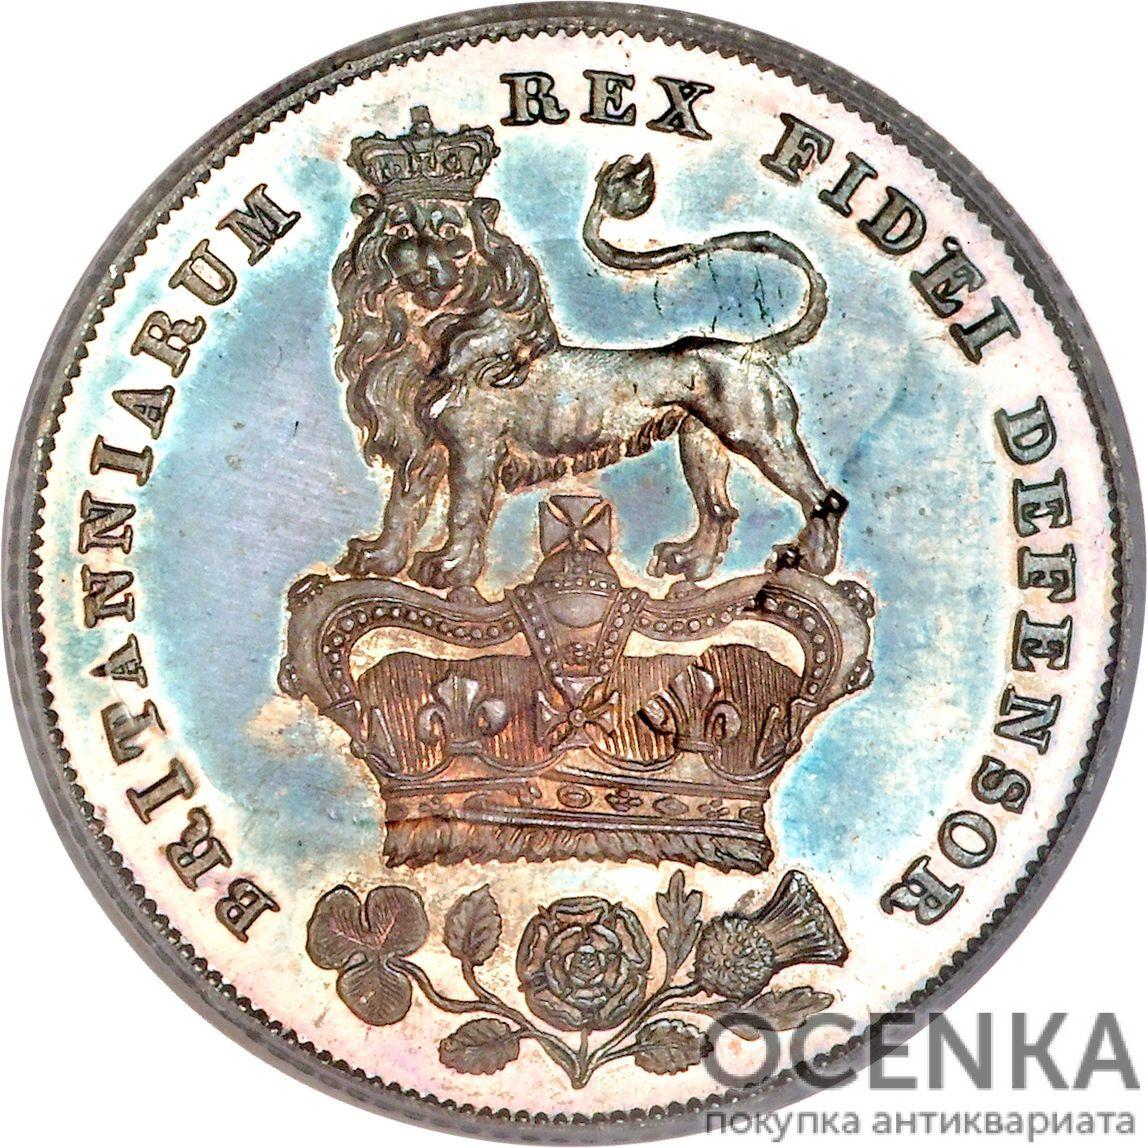 Серебряная монета 1 Шиллинг (1 Shilling) Великобритания - 6